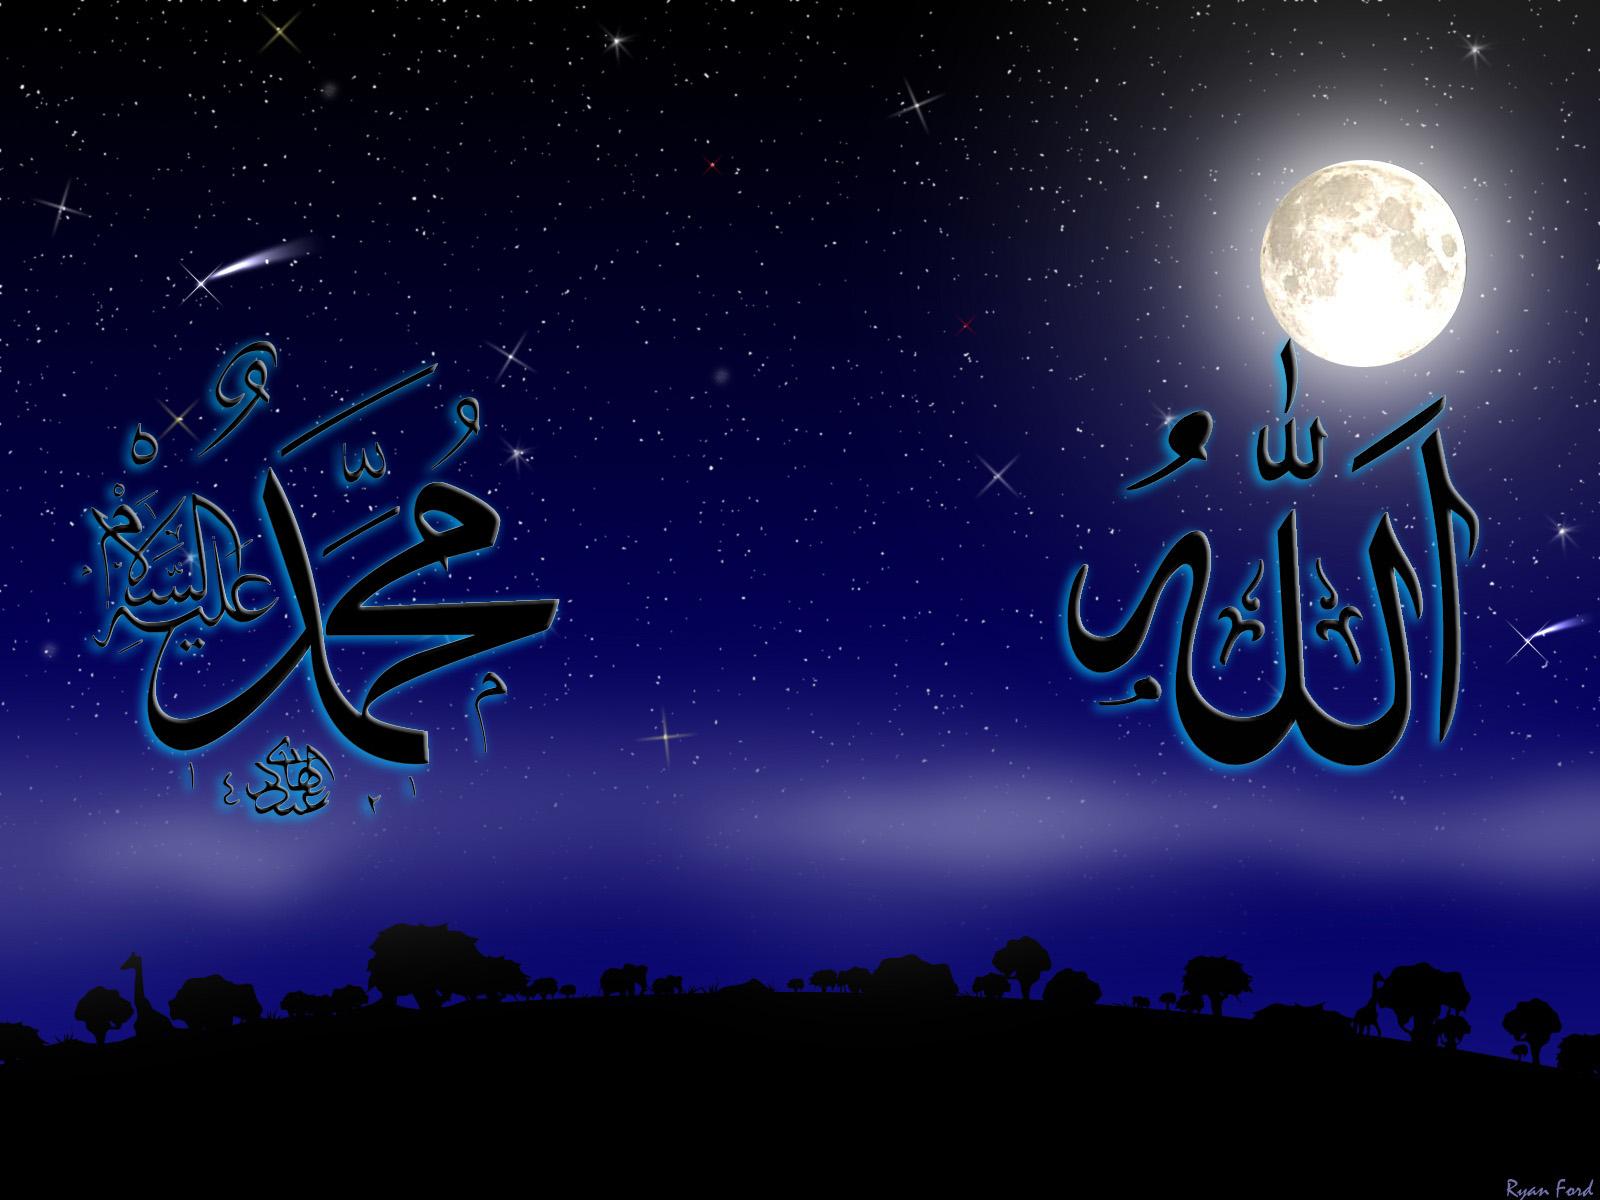 Allah dan Muhammad dalam lafadz yang indah. Wallpaper dengan desain ...